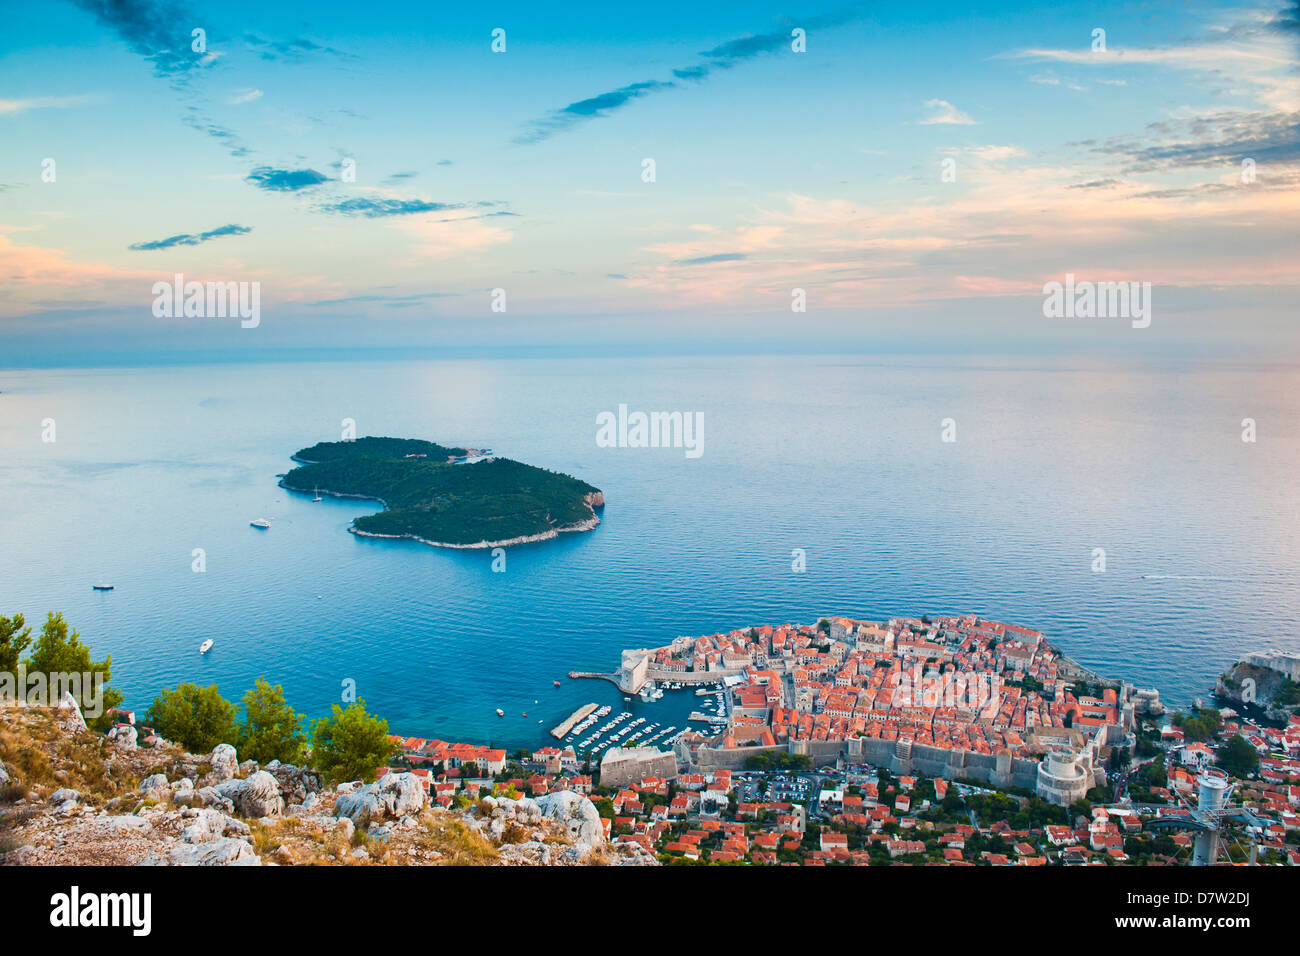 View over Dubrovnik, Lokum Island and Adriatic Sea, Dubrovnik, Dalmatian Coast, Croatia - Stock Image